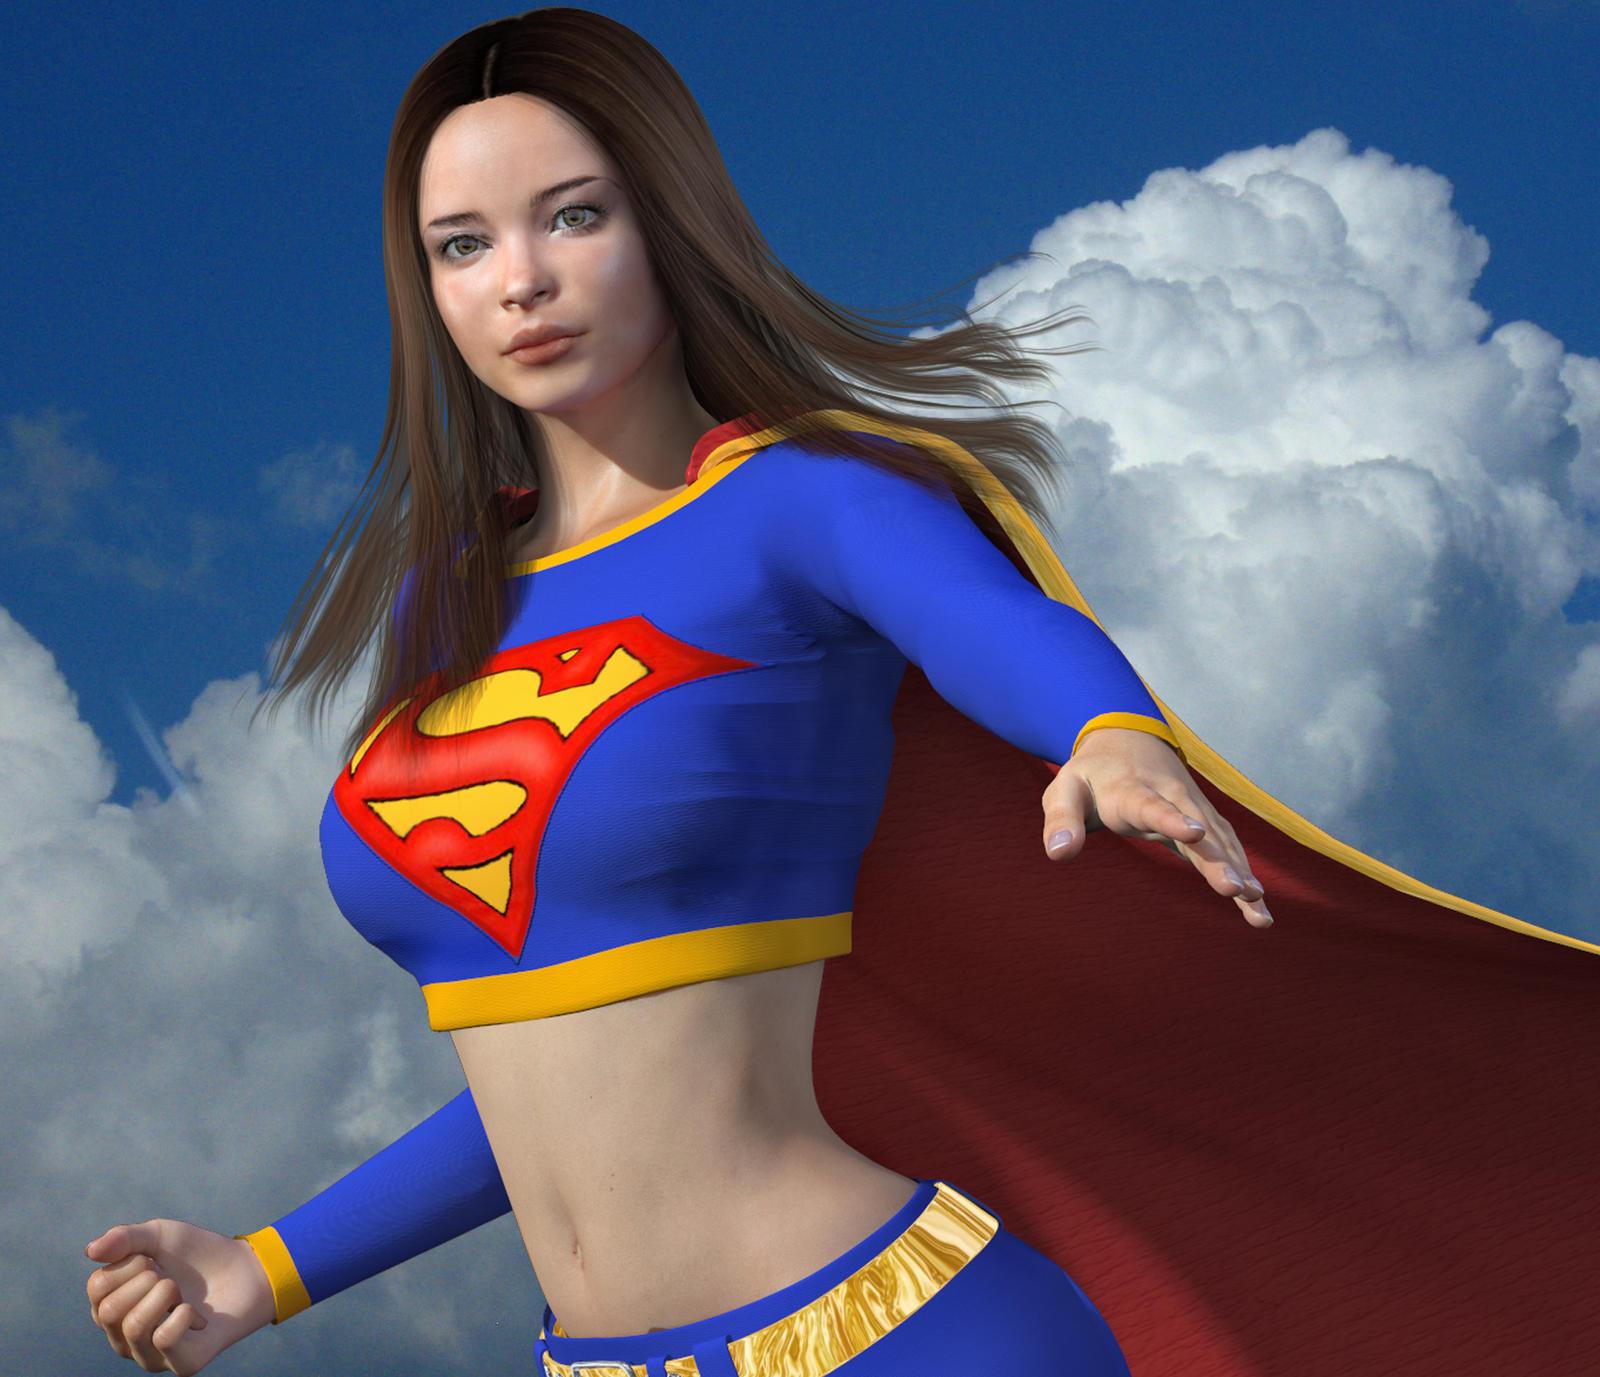 Lana Lang as Supergirl by qaz-art on DeviantArt